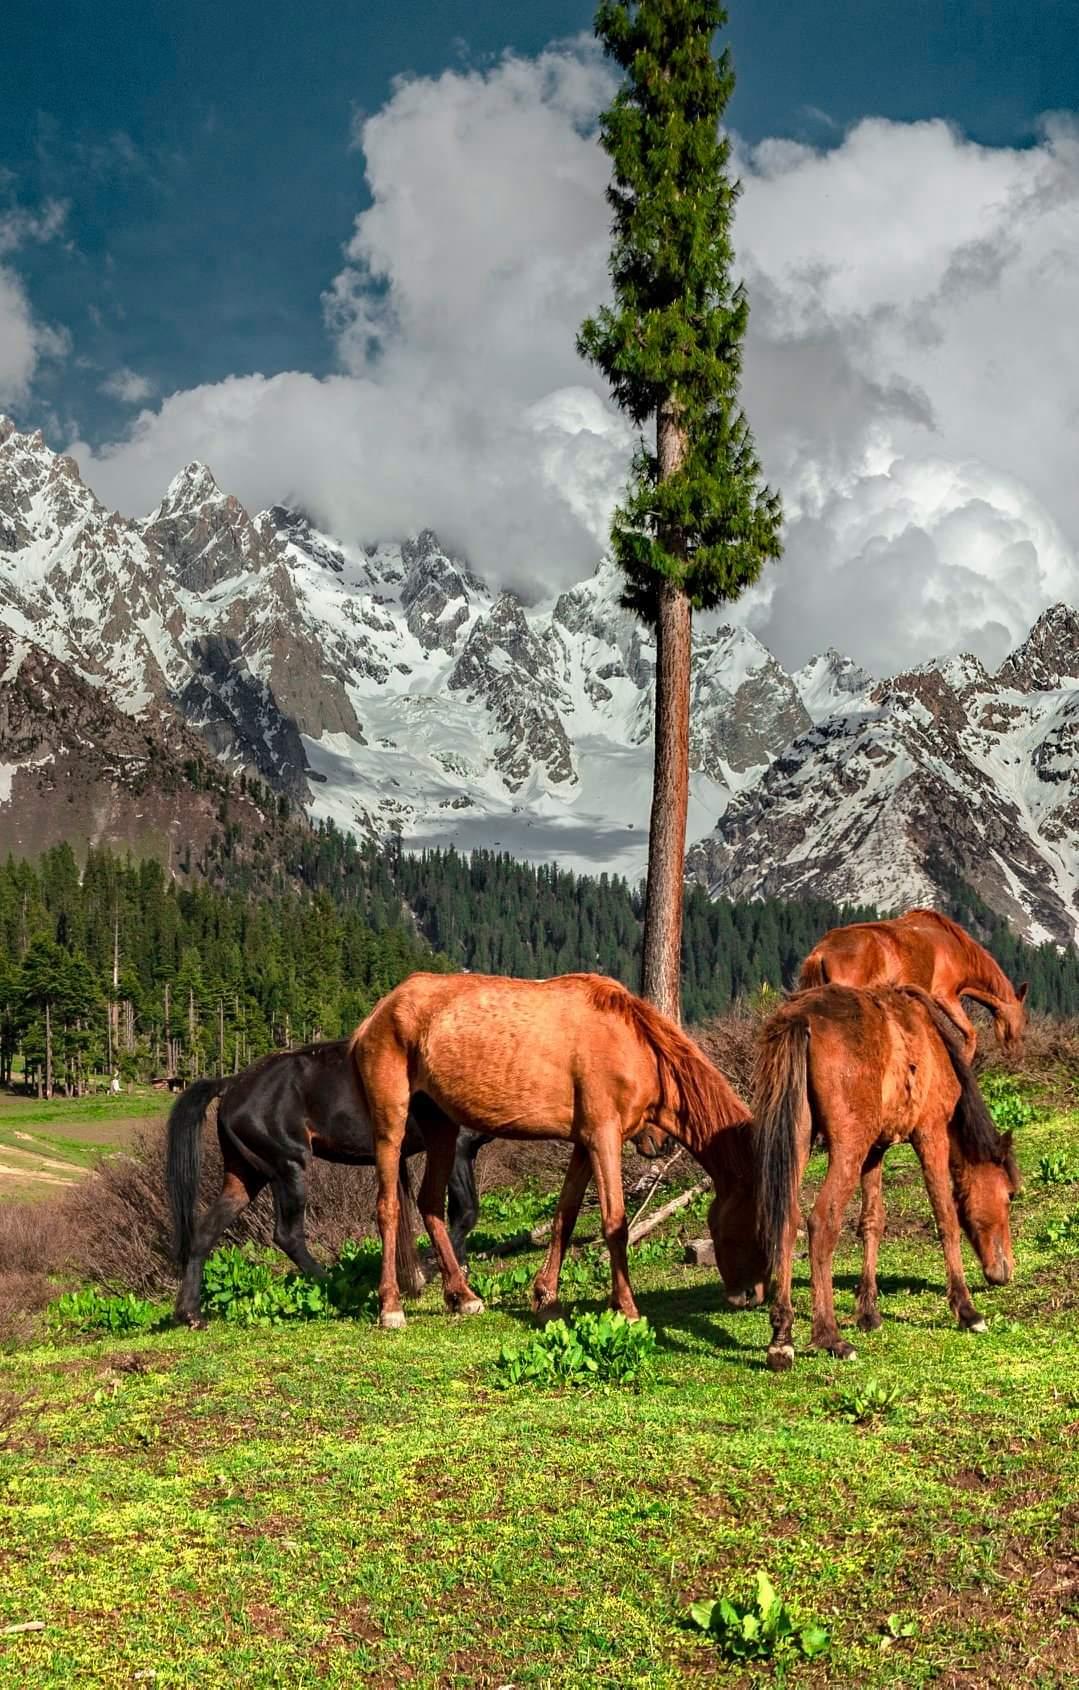 Jag Banal - Mankial in the Back - Swat Valley - https://t.co/EabH3uV3eC